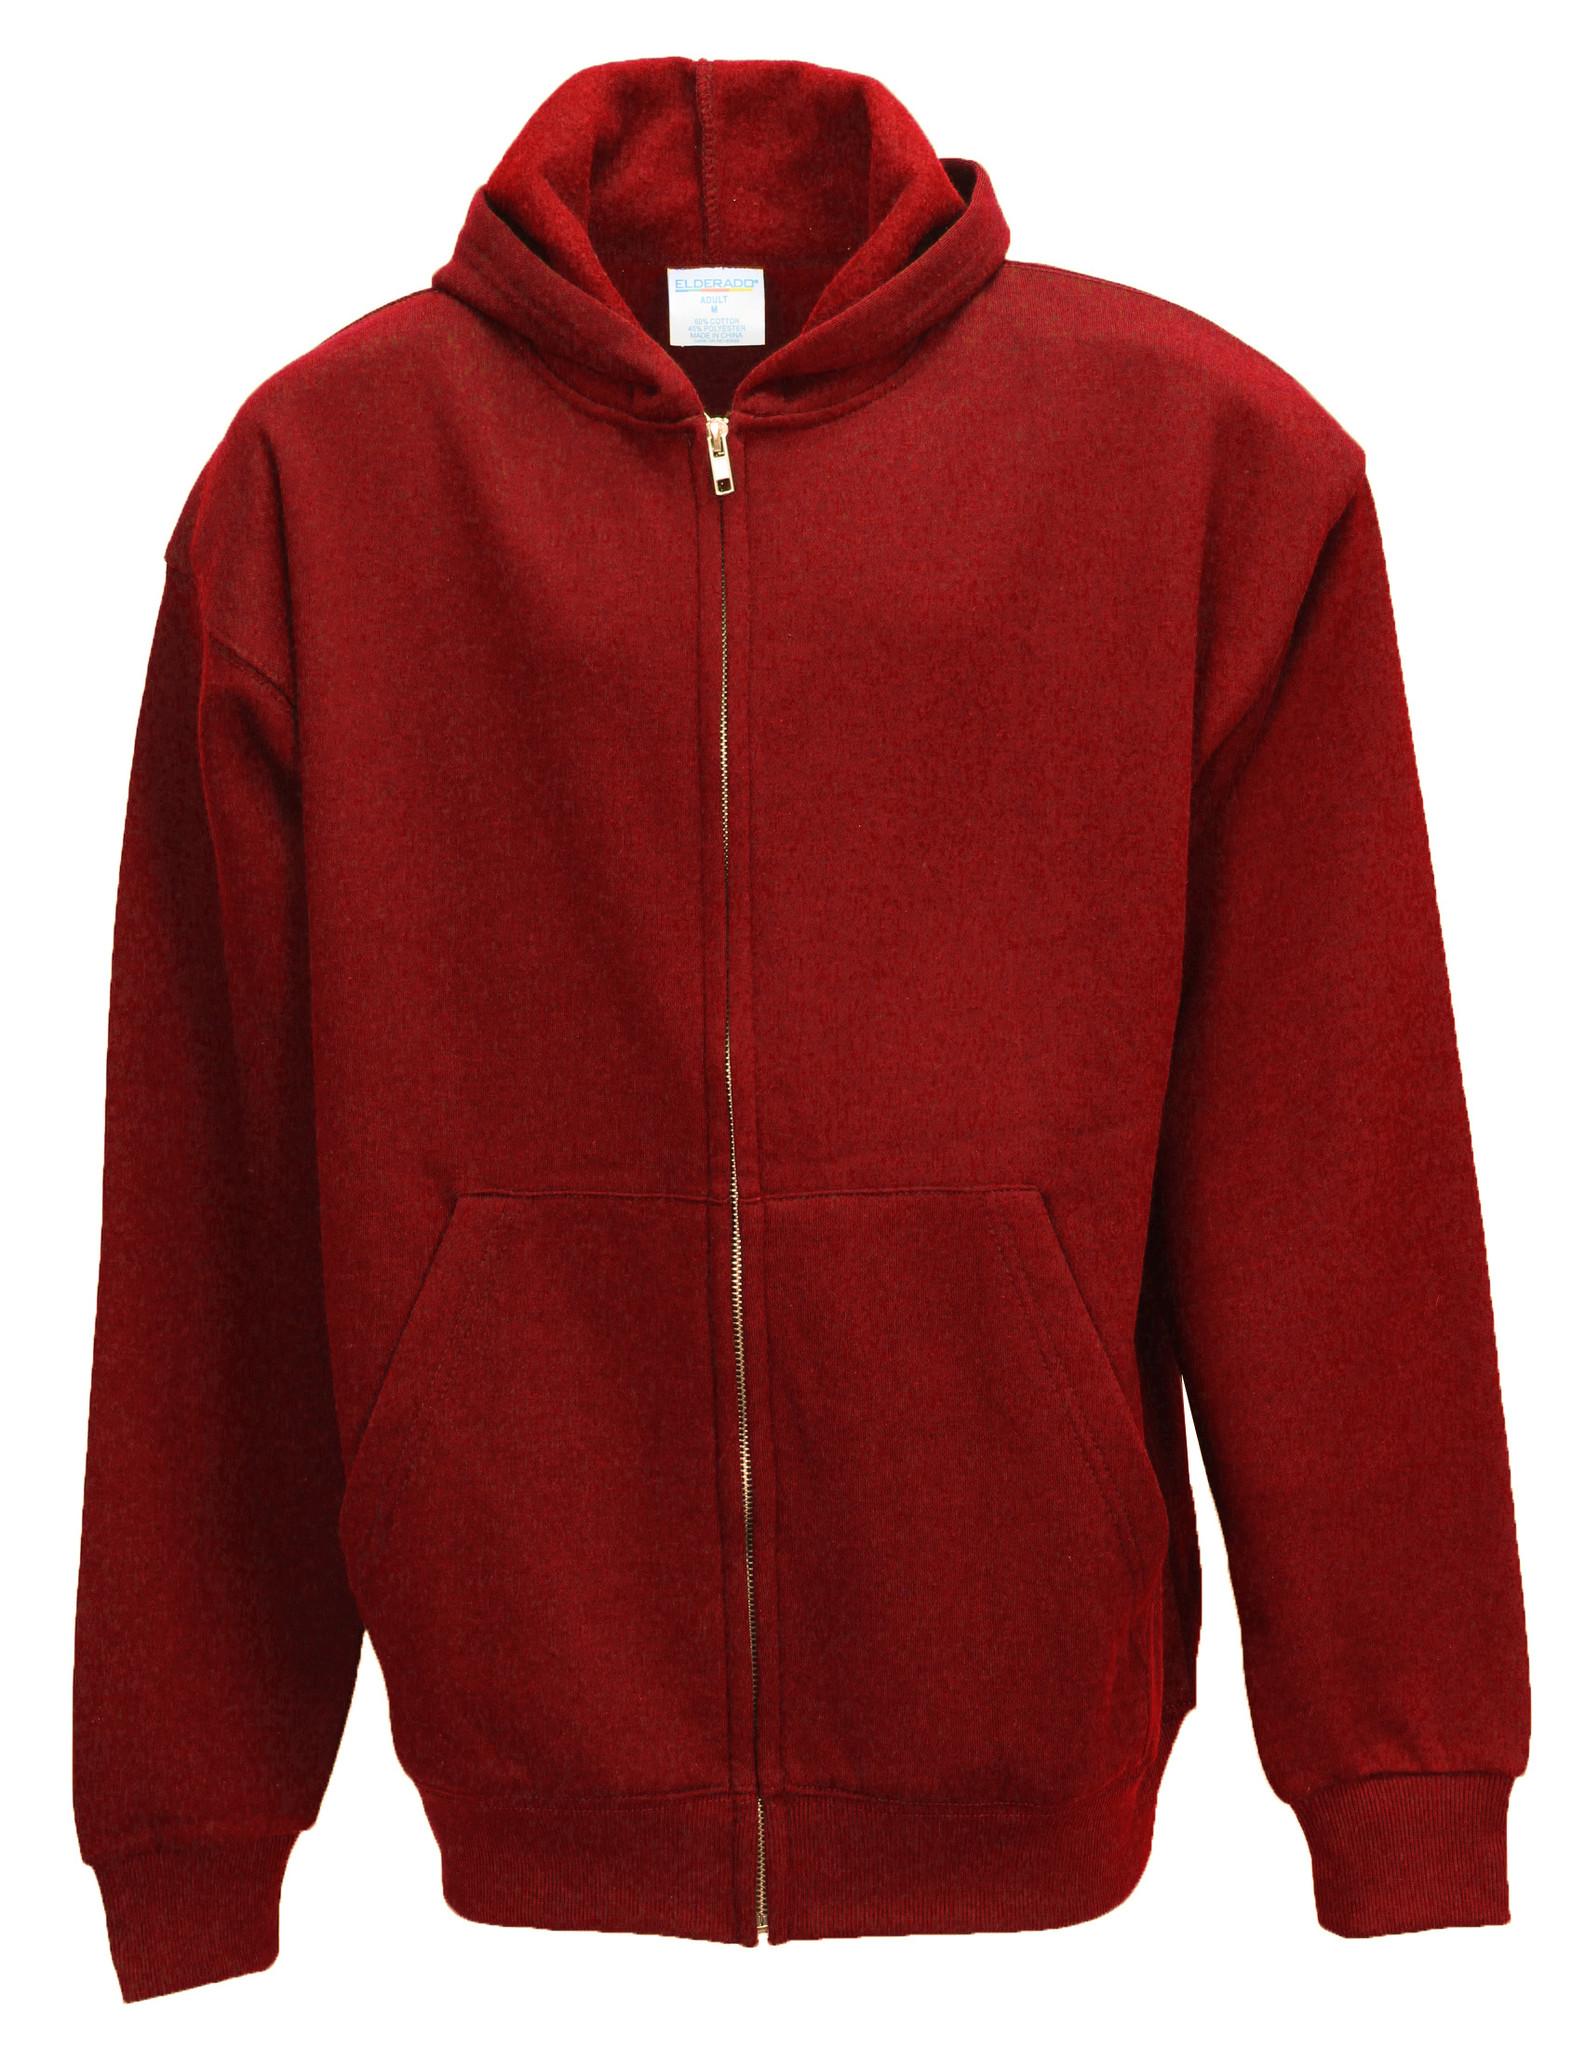 St. Thomas More Zipper Sweatshirt